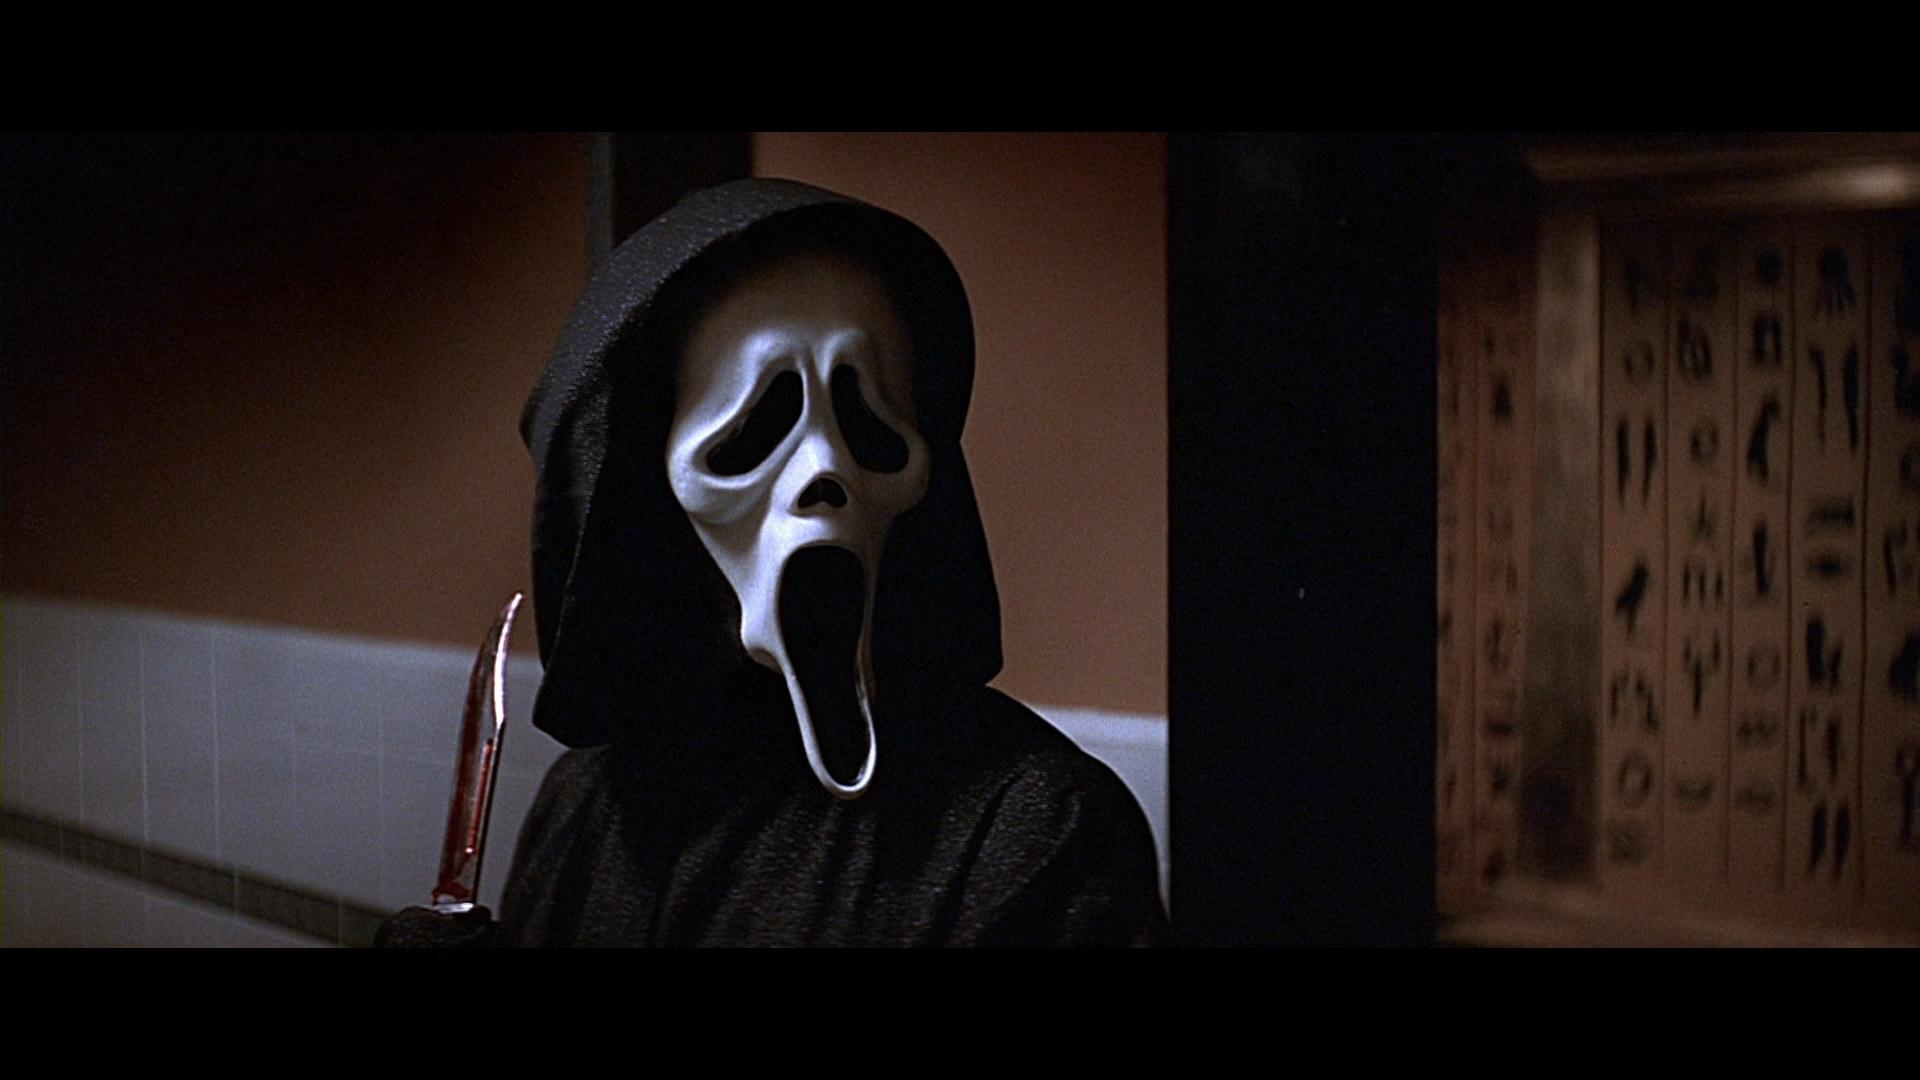 scream - photo #36